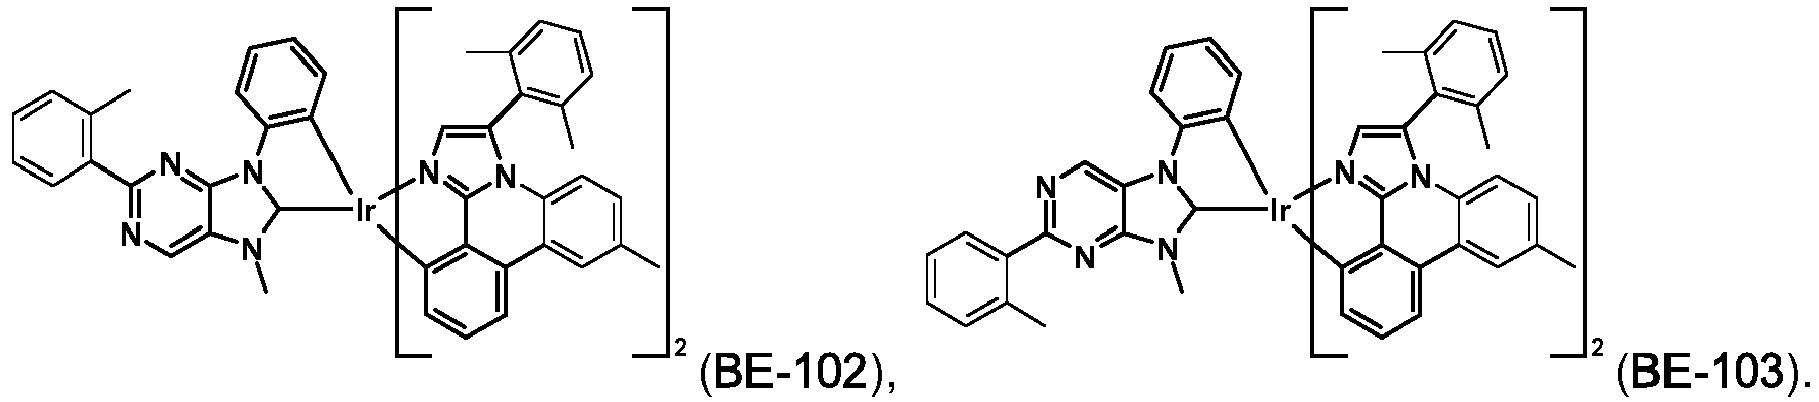 Figure imgb0798